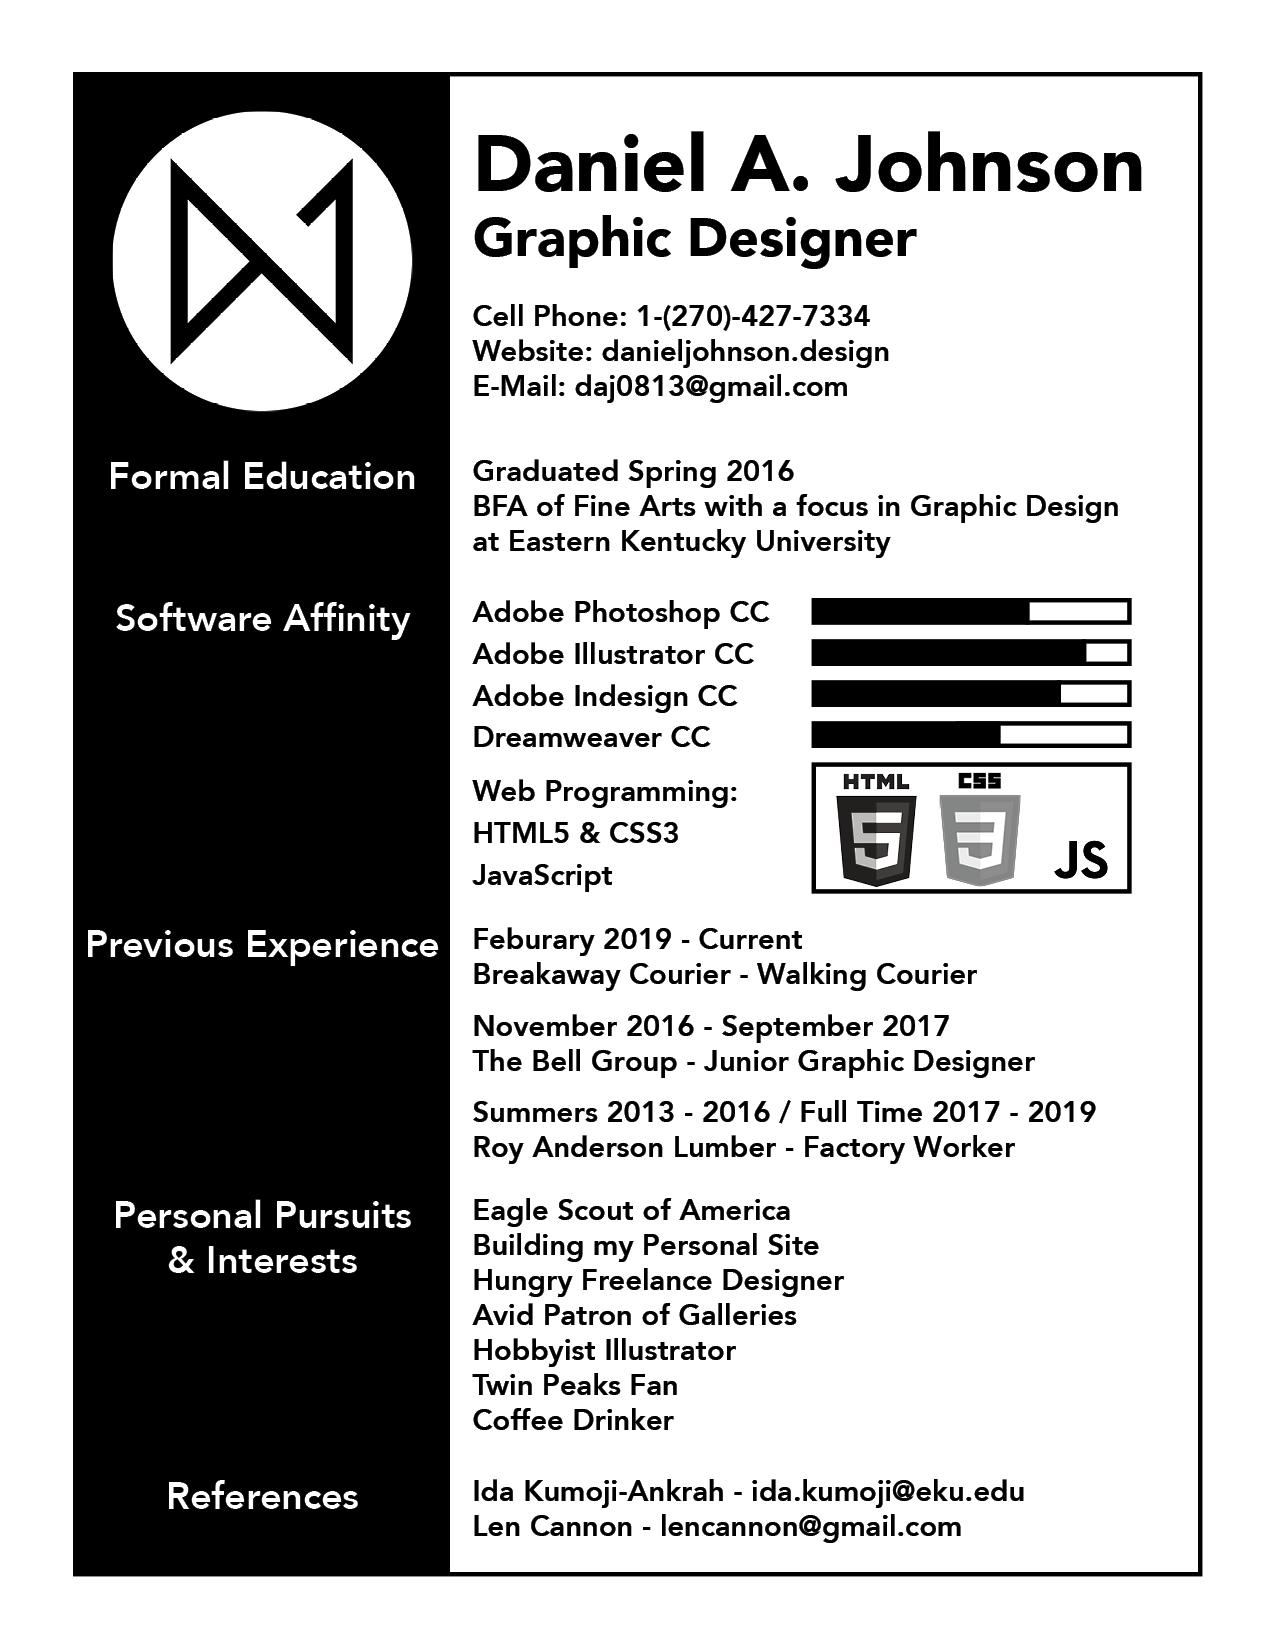 Resume 2019 BW.png